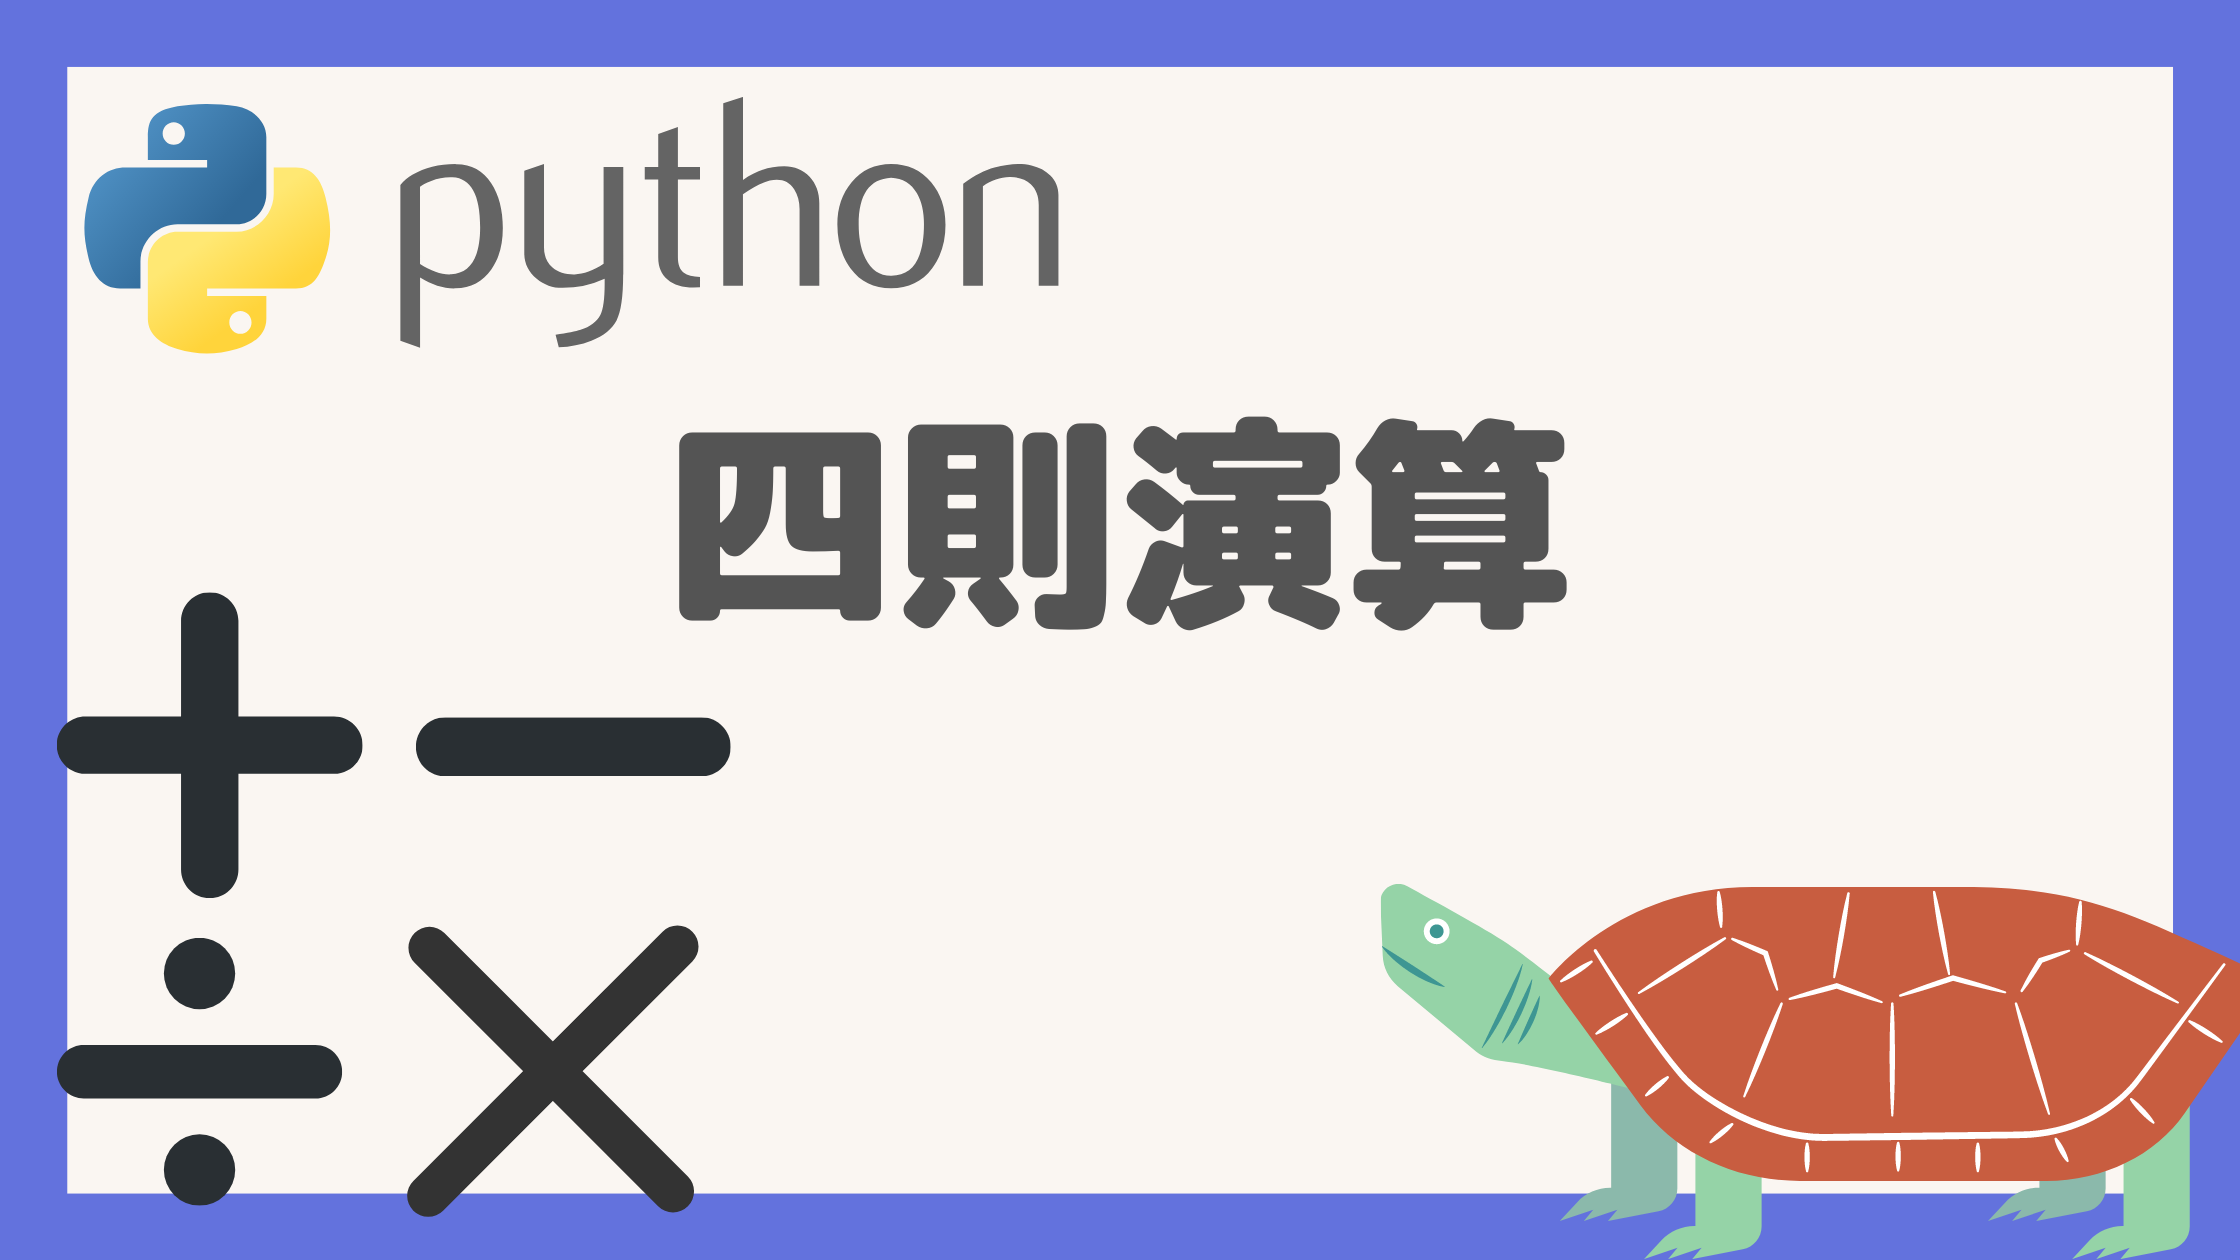 pythonの四則演算のアイキャッチ